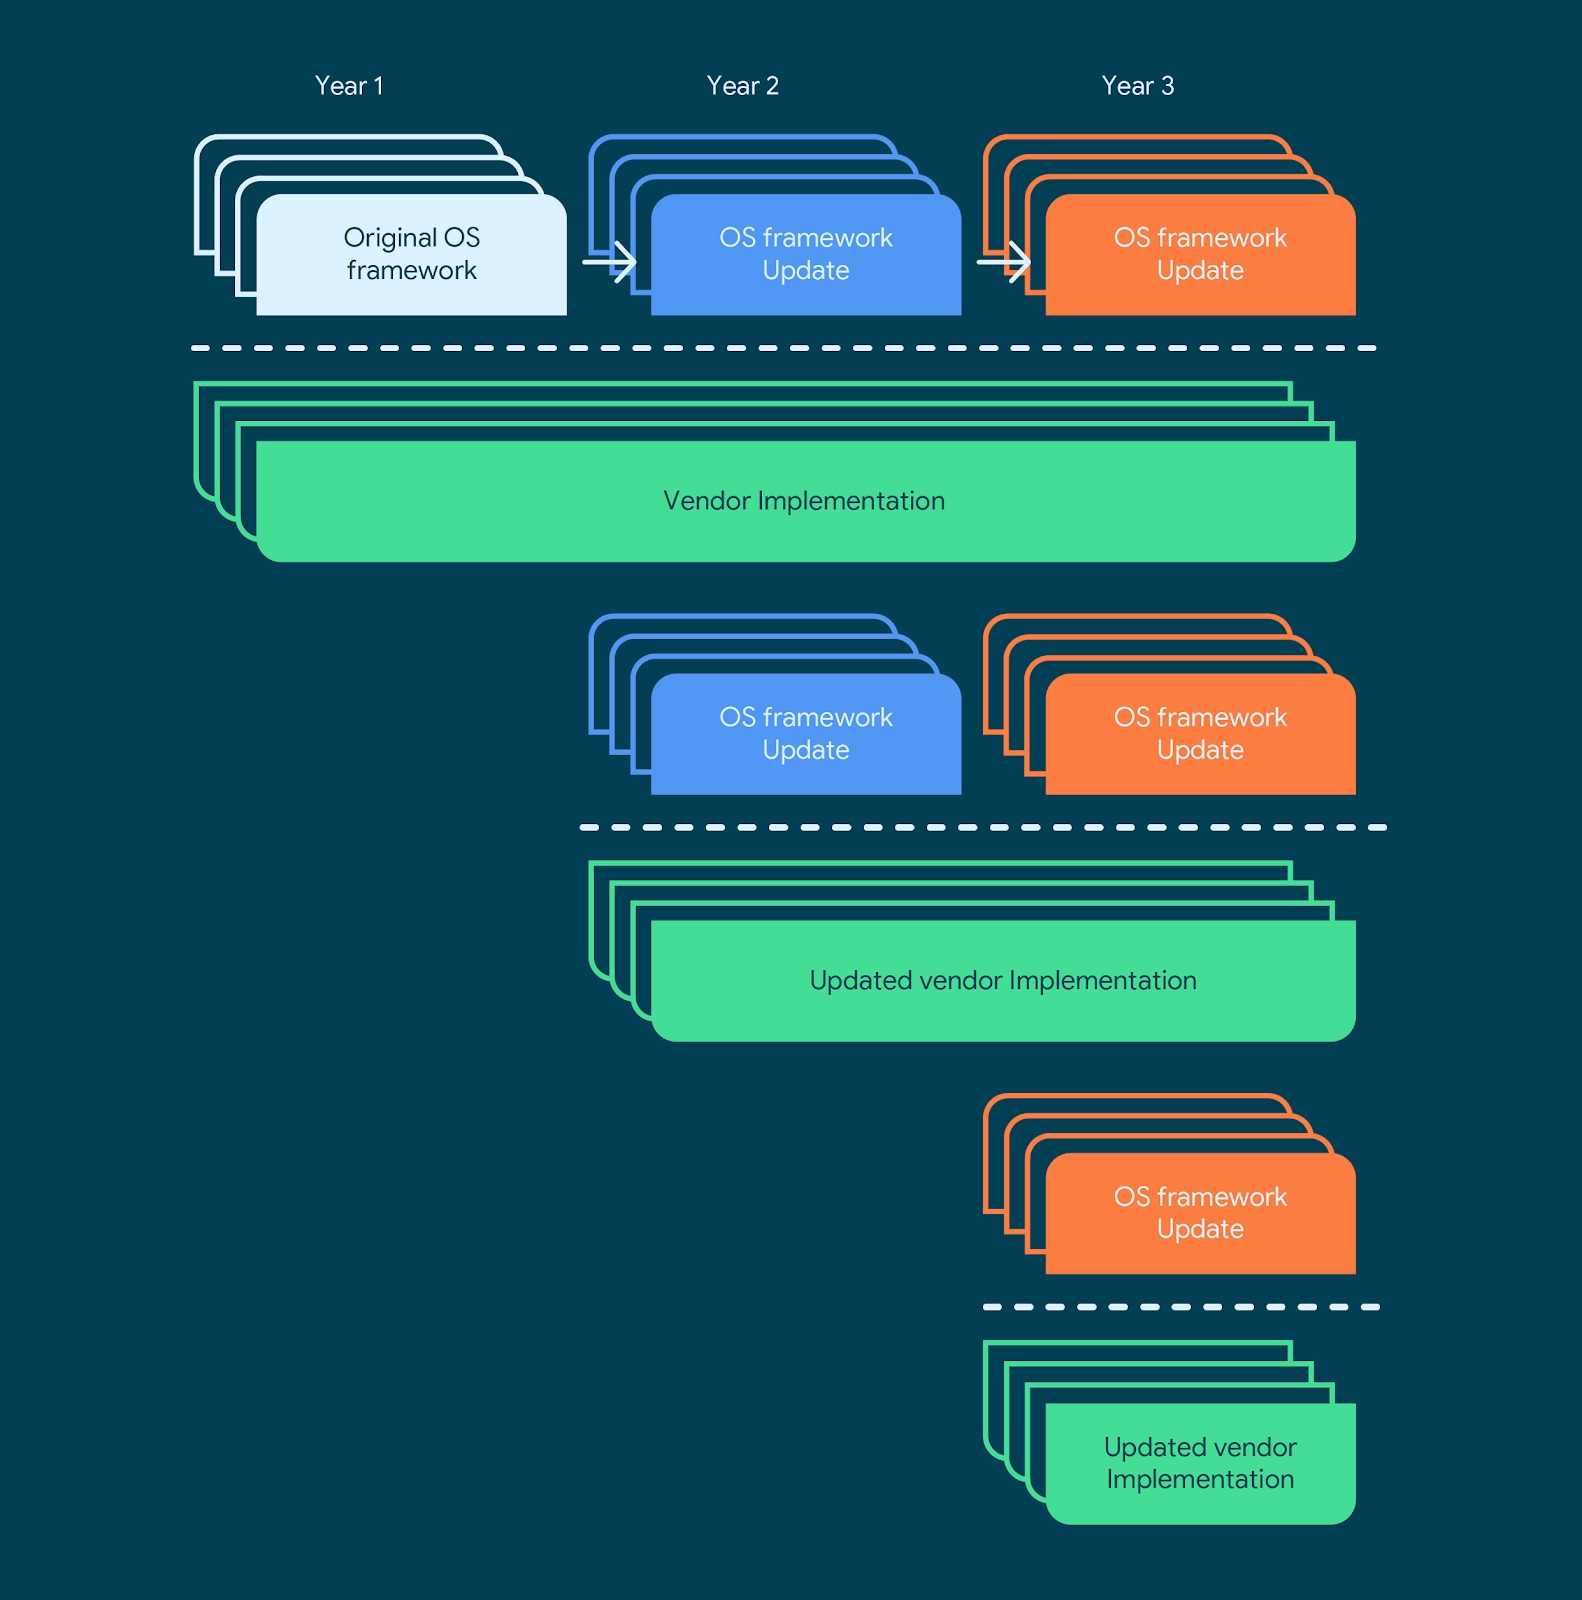 Proces implementácie nadstavby na framework OS Android